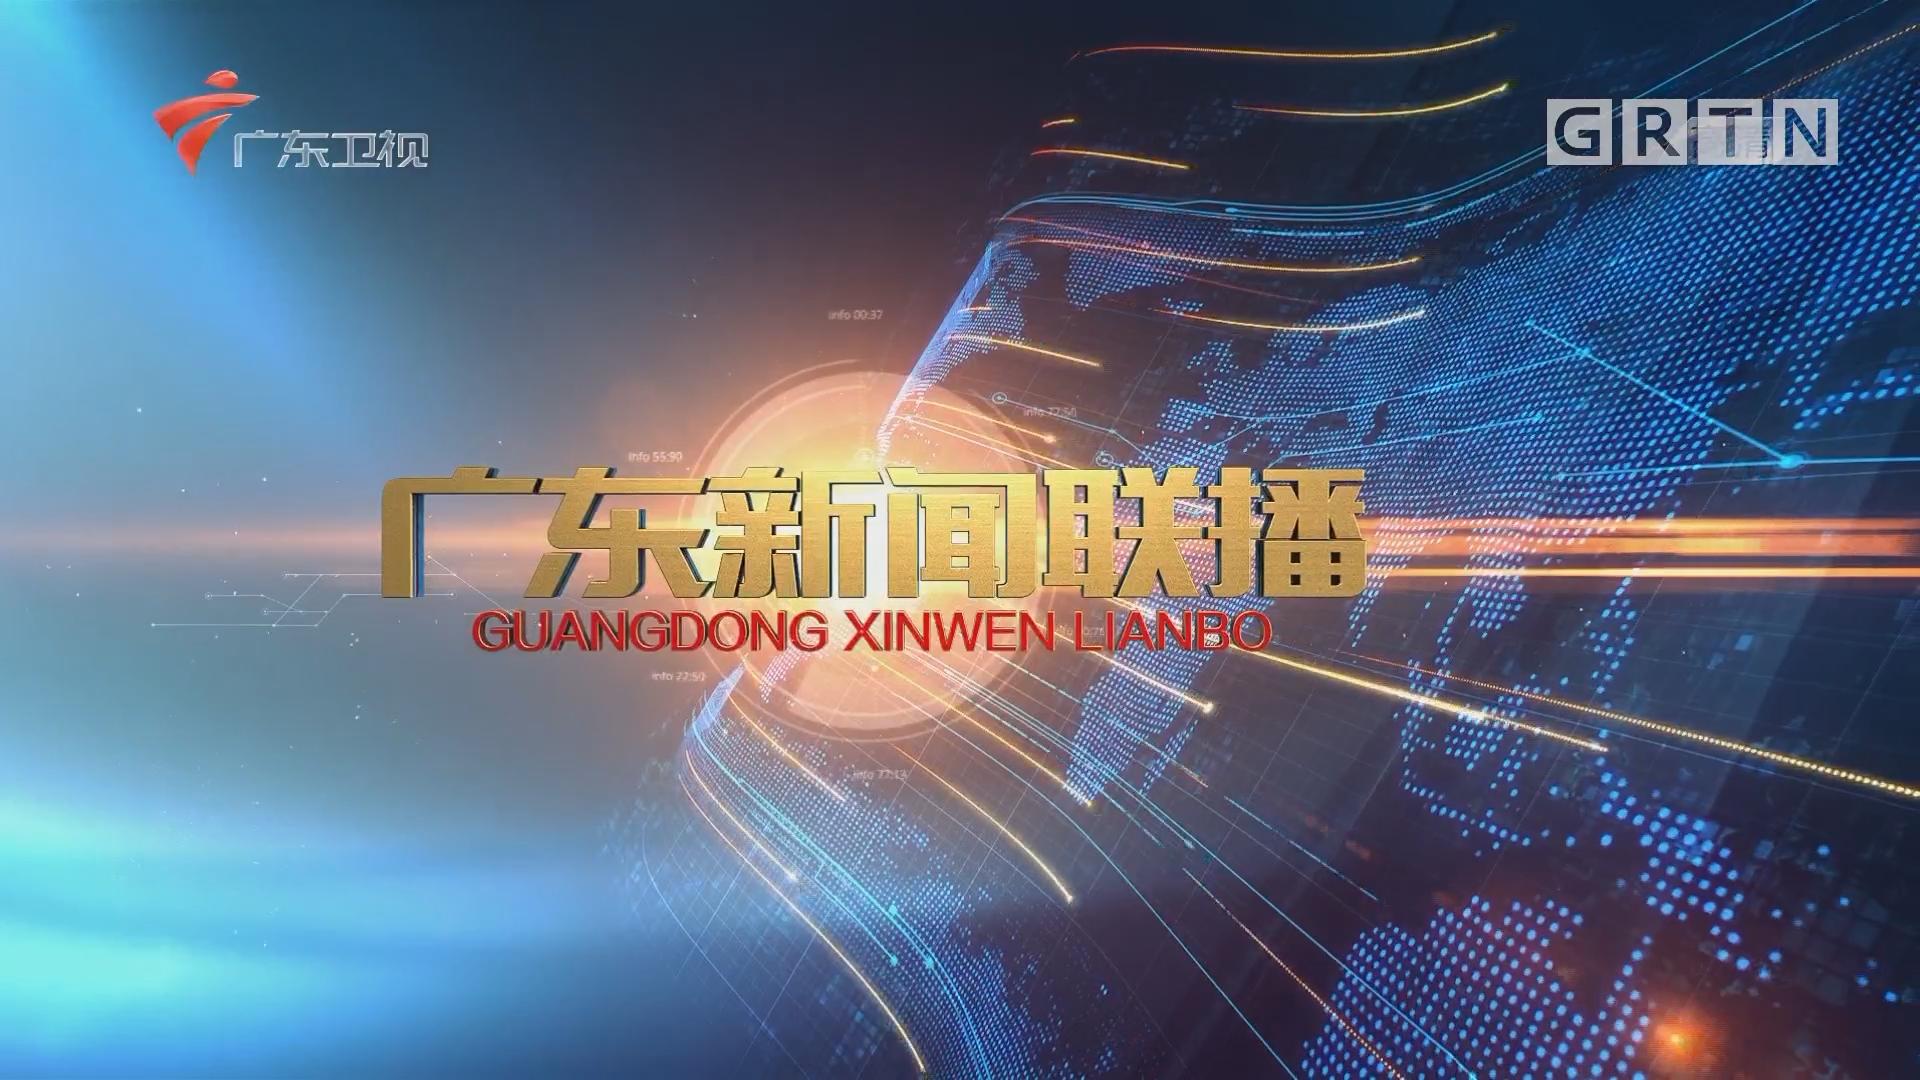 [HD][2018-06-24]广东新闻联播:广东:大力推动产业结构优化调整 加快建设现代化经济体系